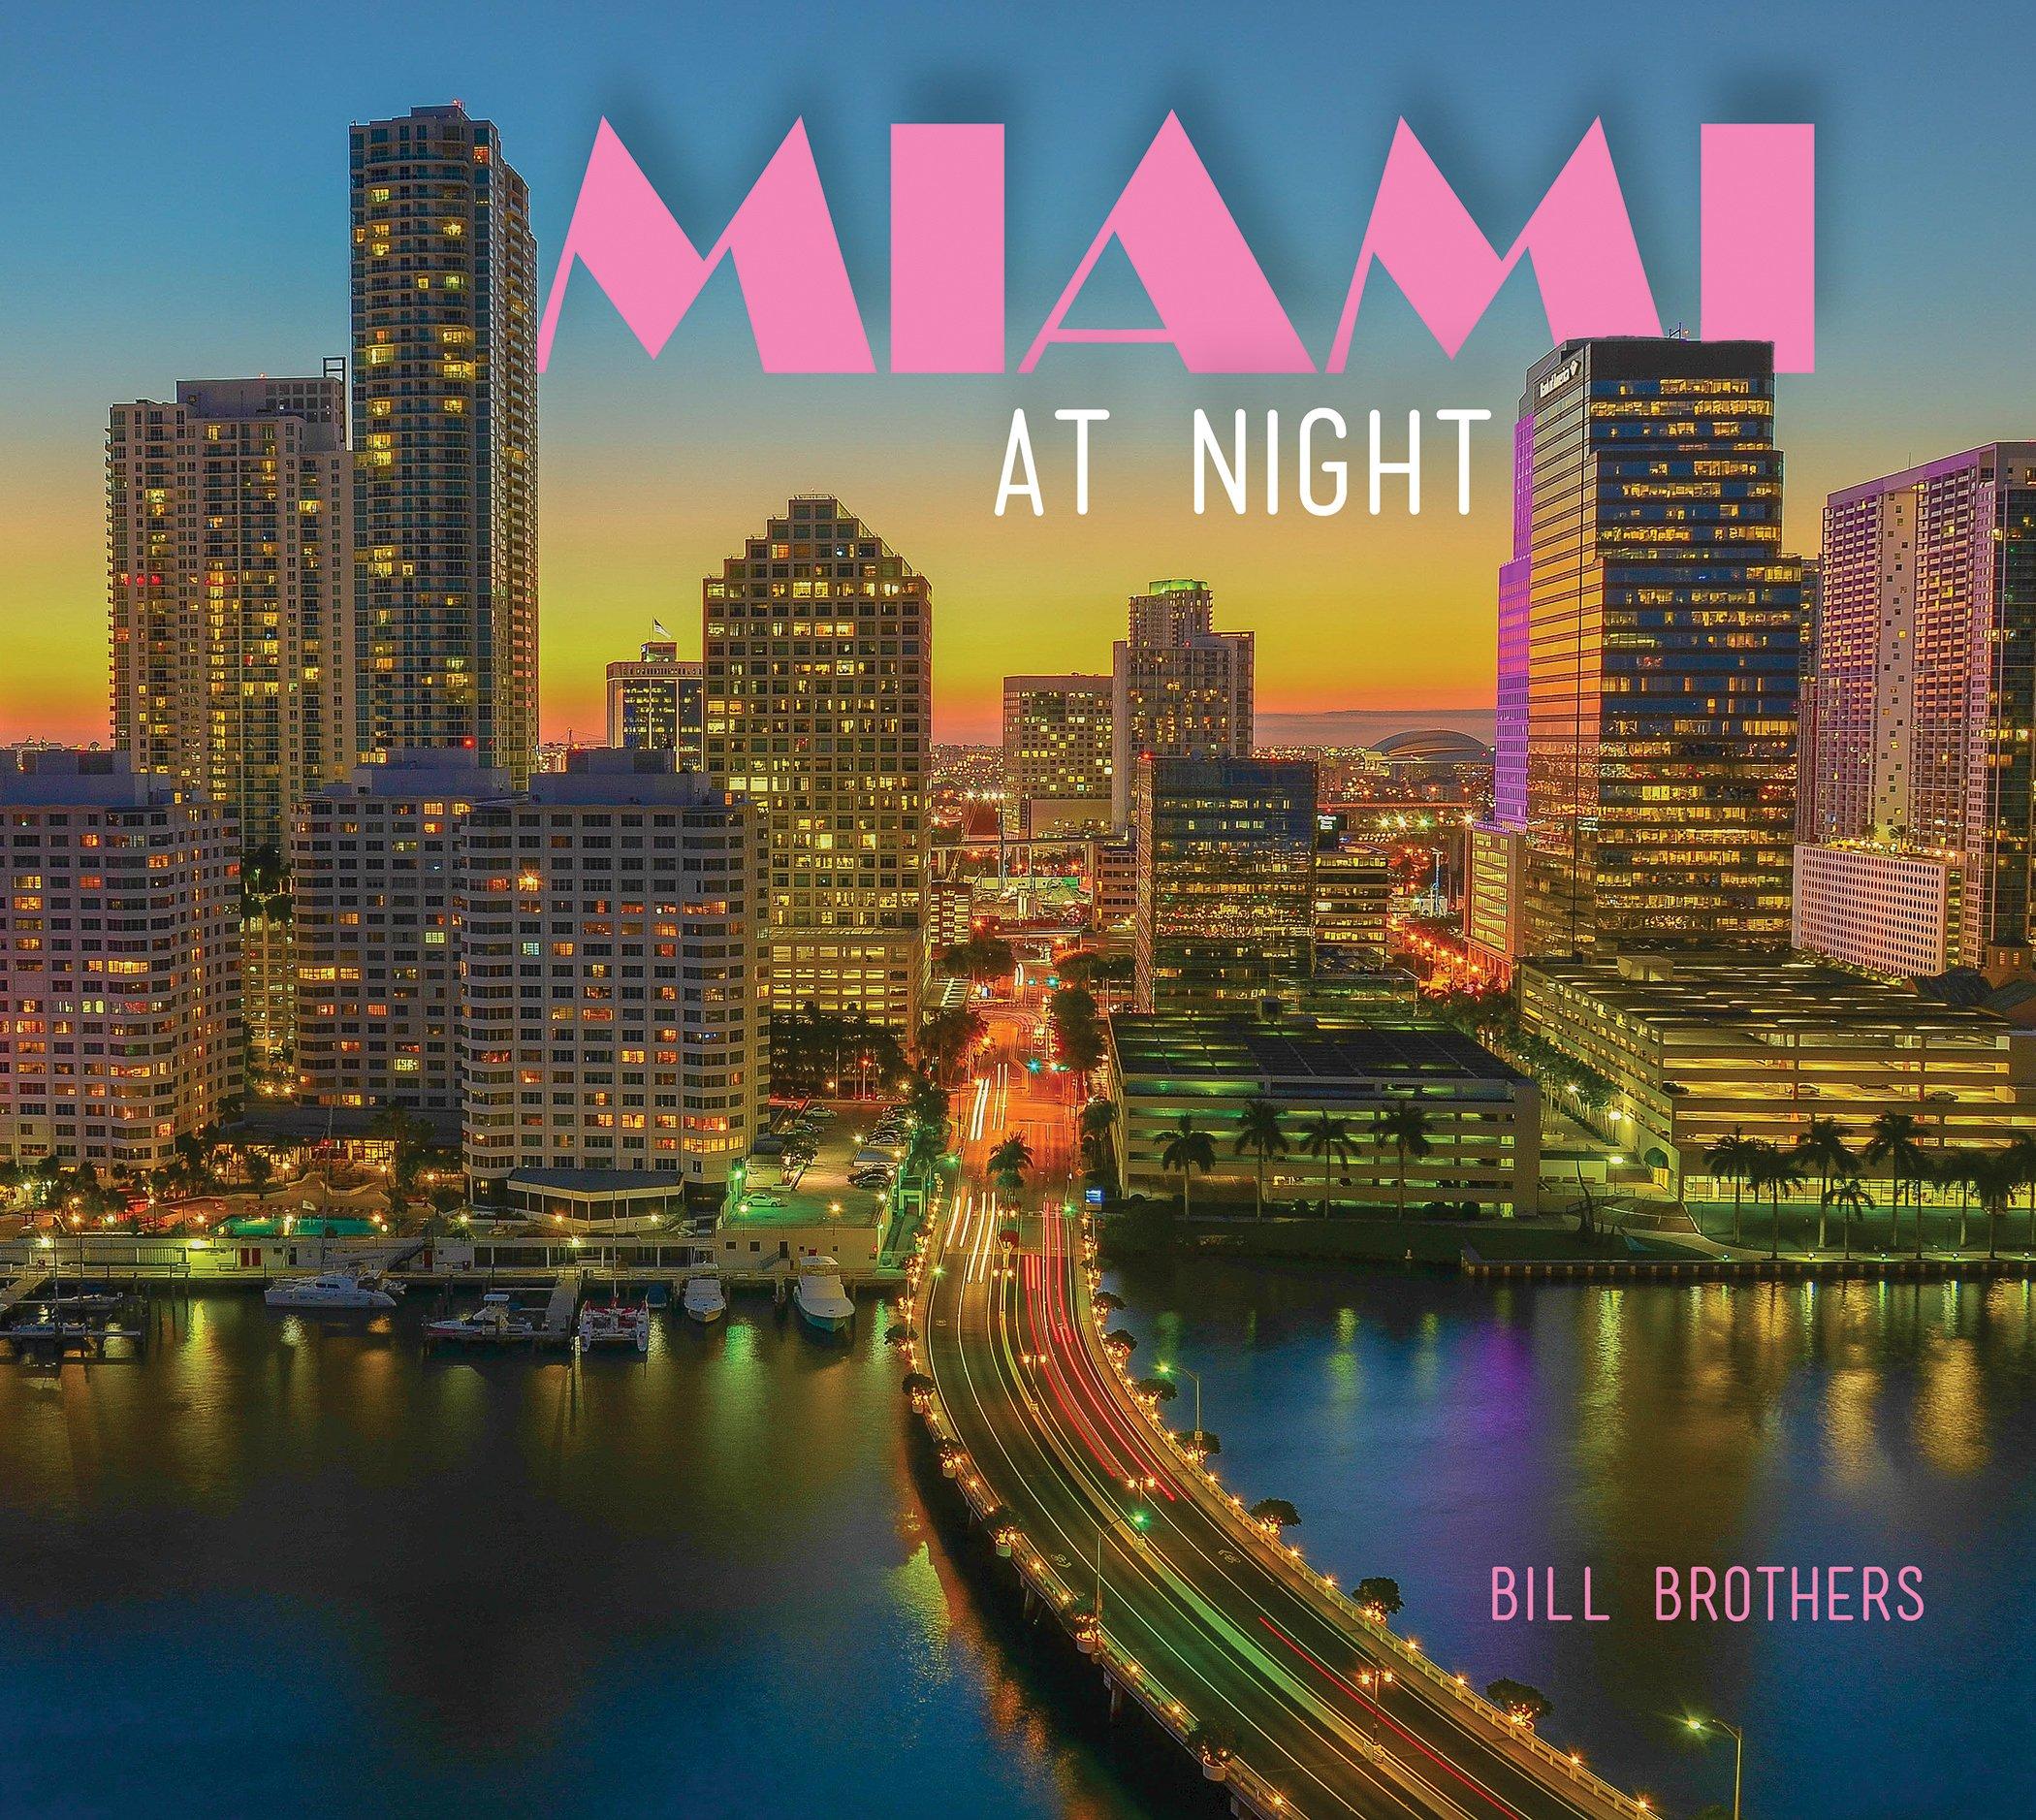 Miami By Night 91t1gopzMtL